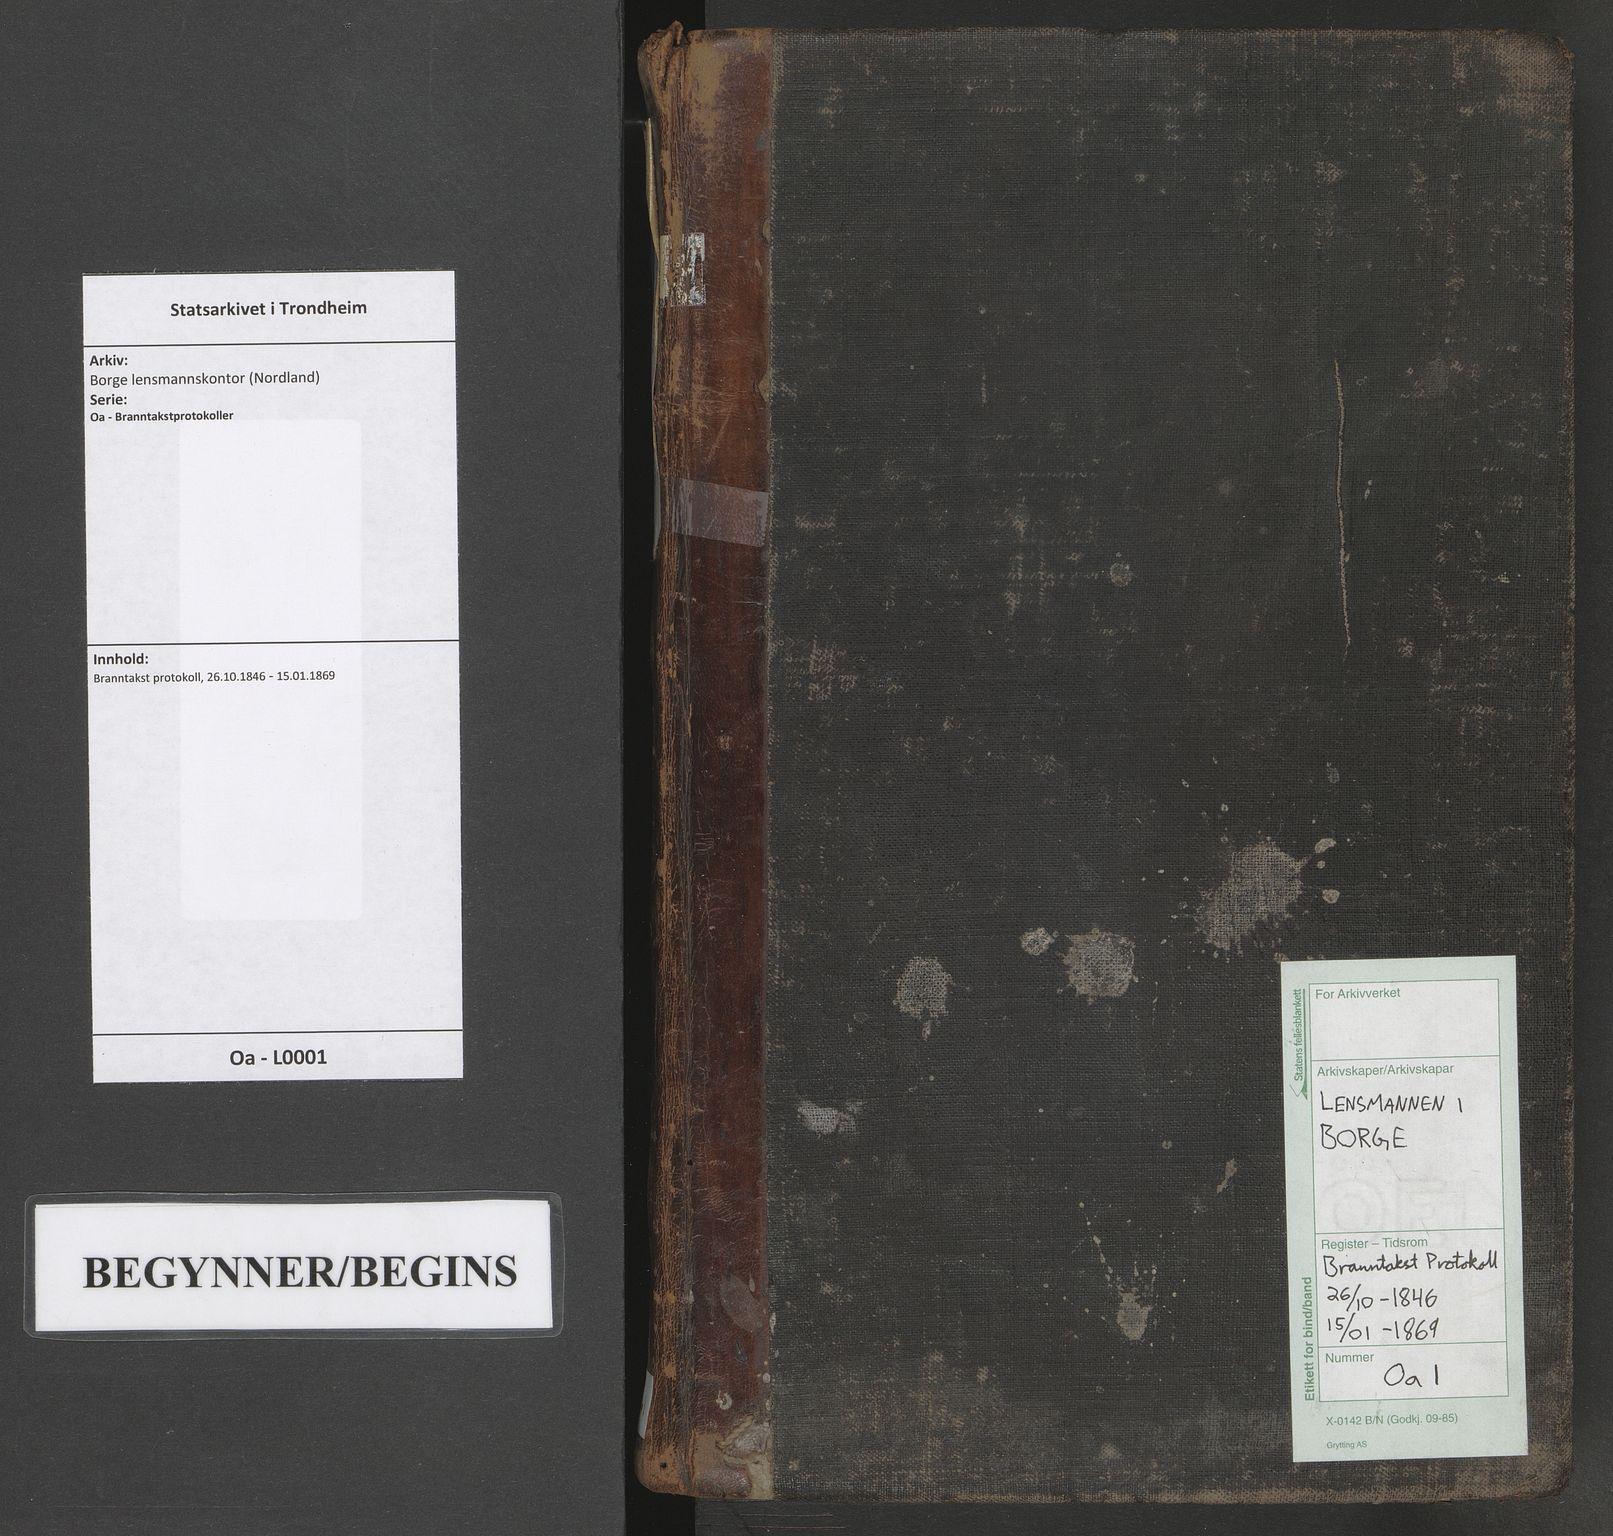 SAT, Borge lensmannskontor (Nordland), Oa/L0001: Branntakst protokoll, 1846-1869